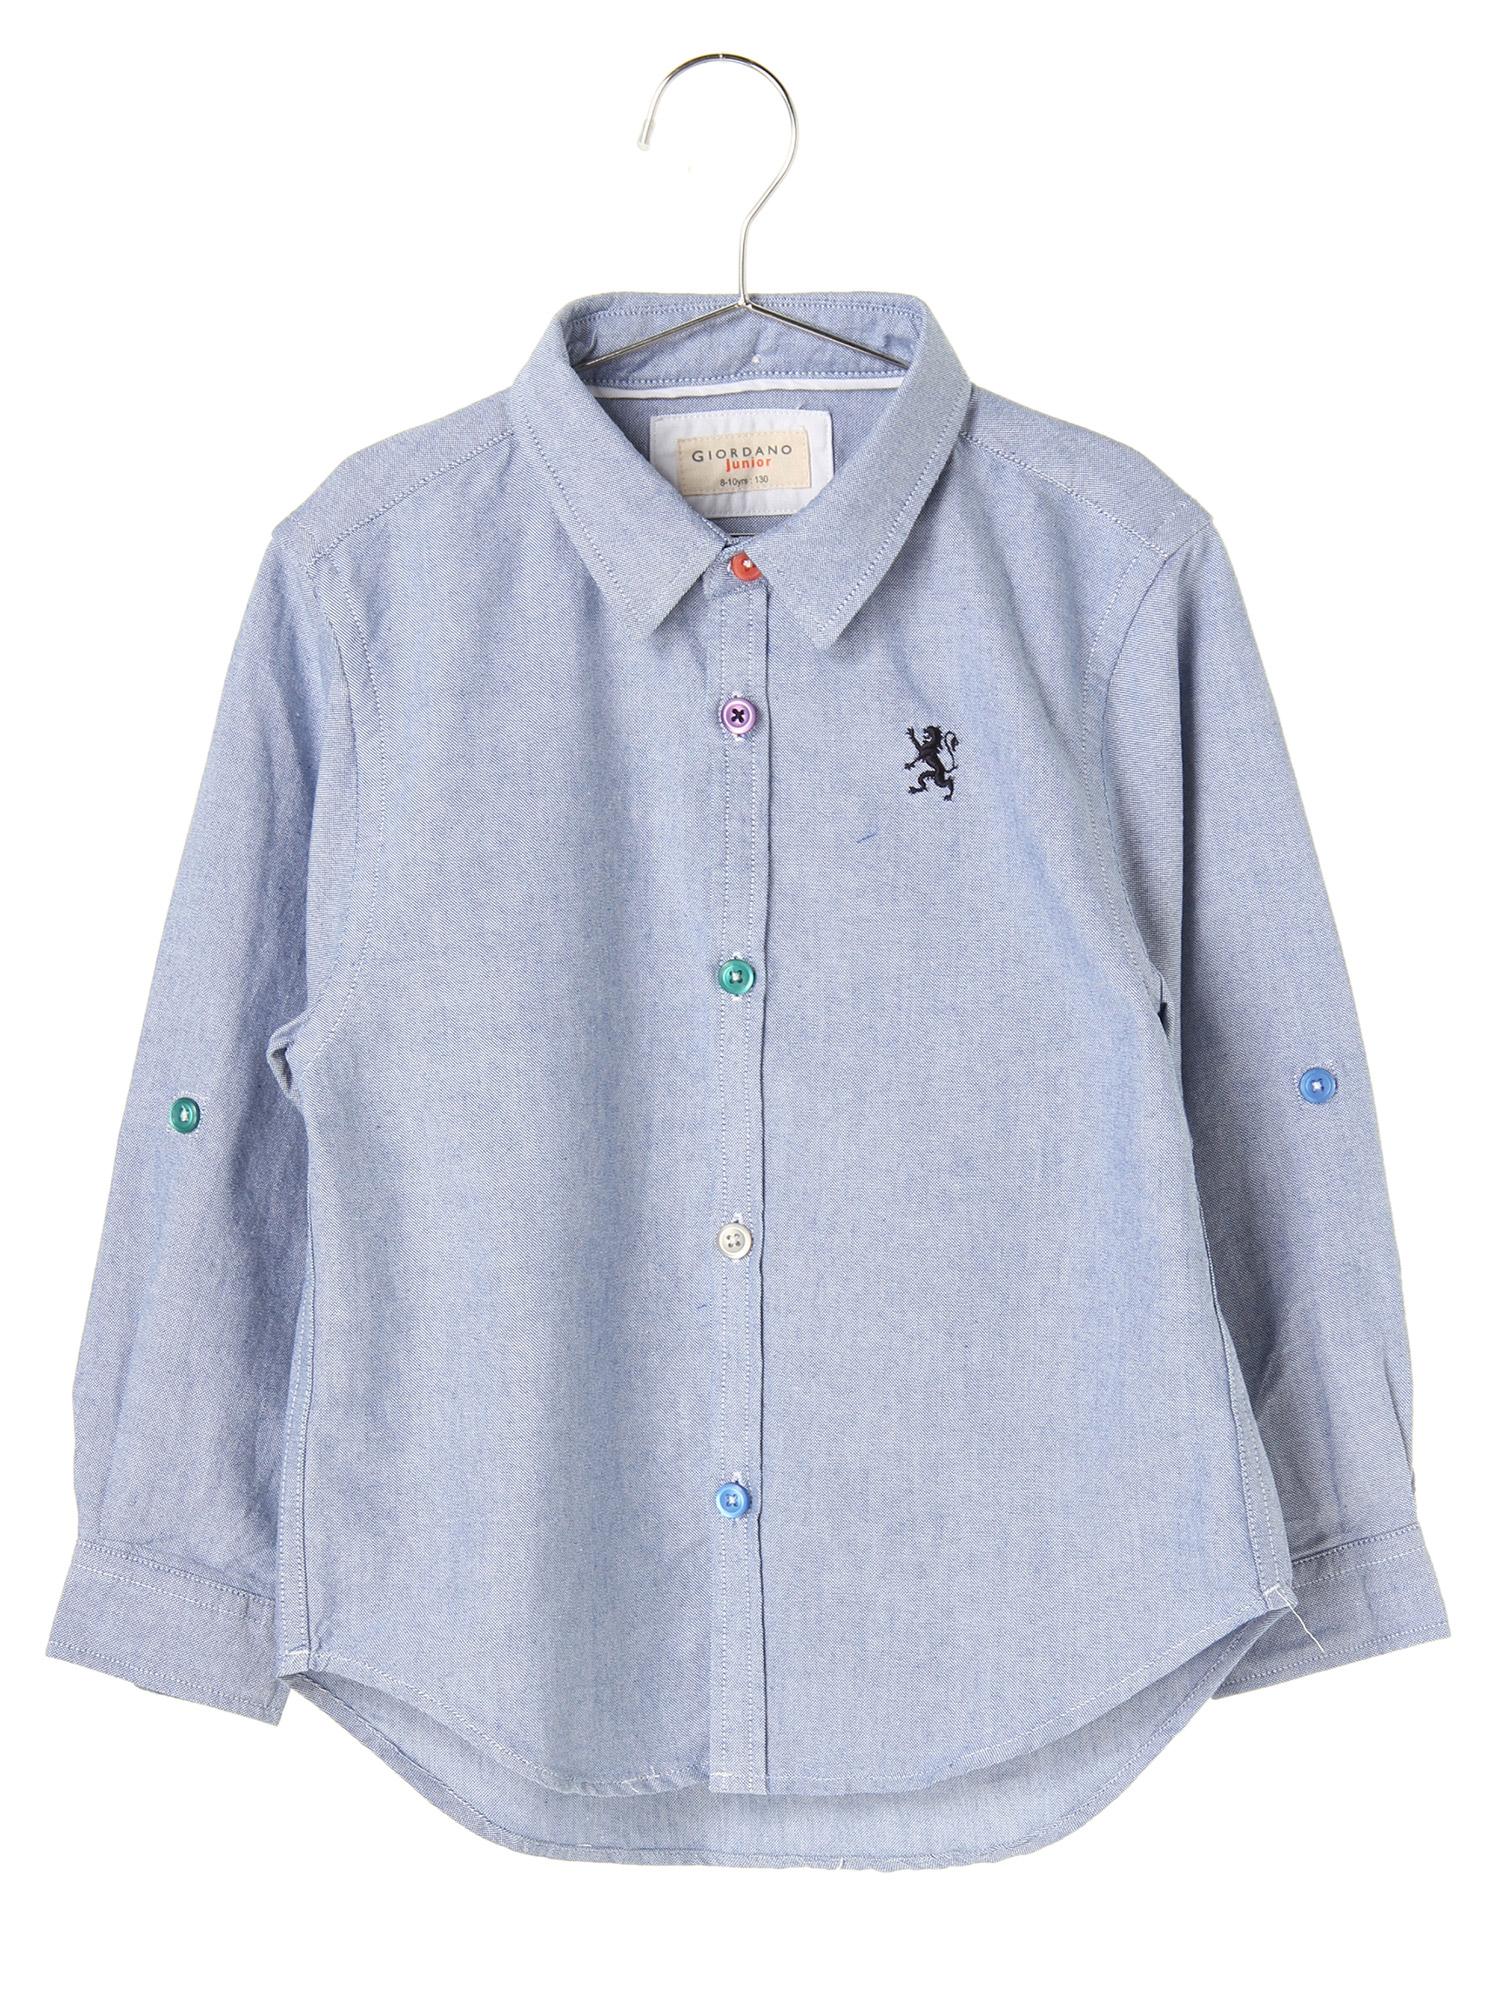 [GIORDANO]ライオン刺繍オックスフォードシャツ